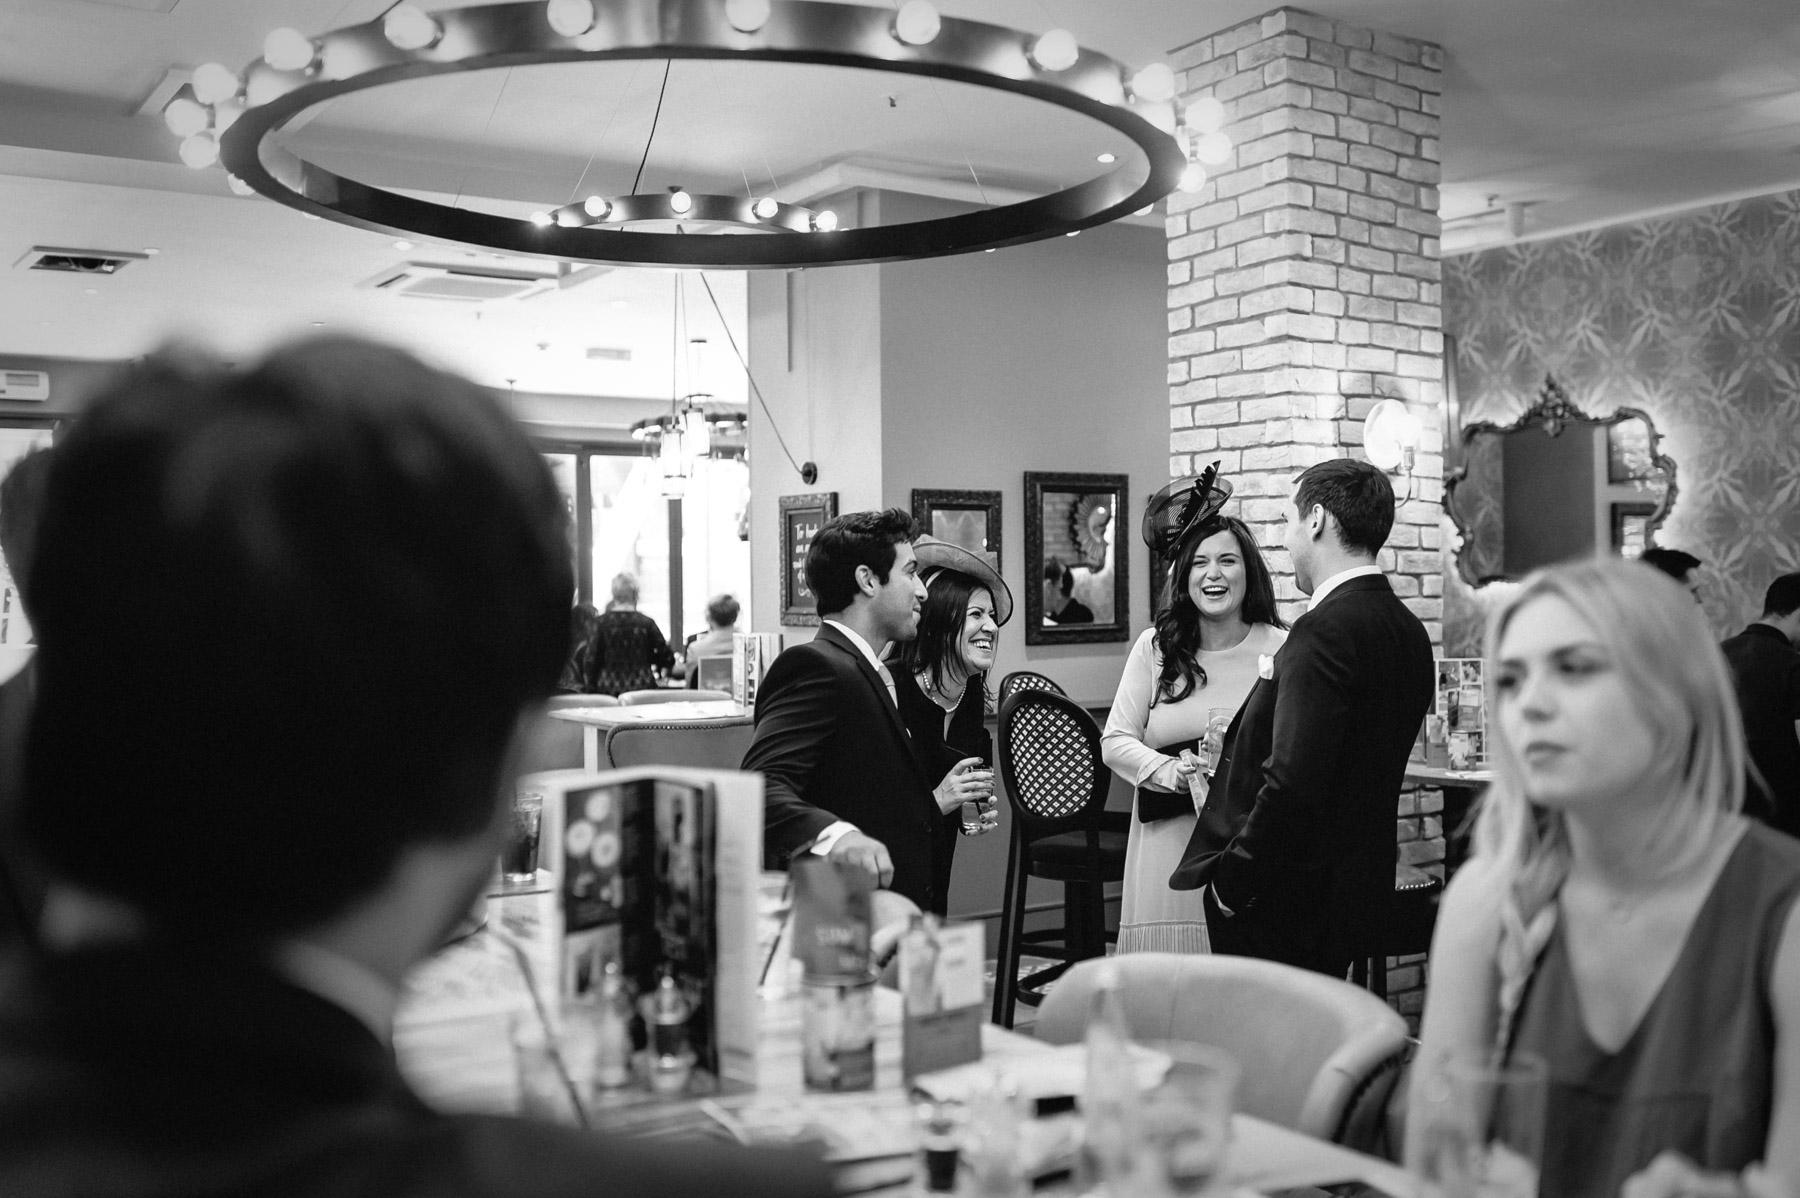 wedding guests meet at a bar before the wedding